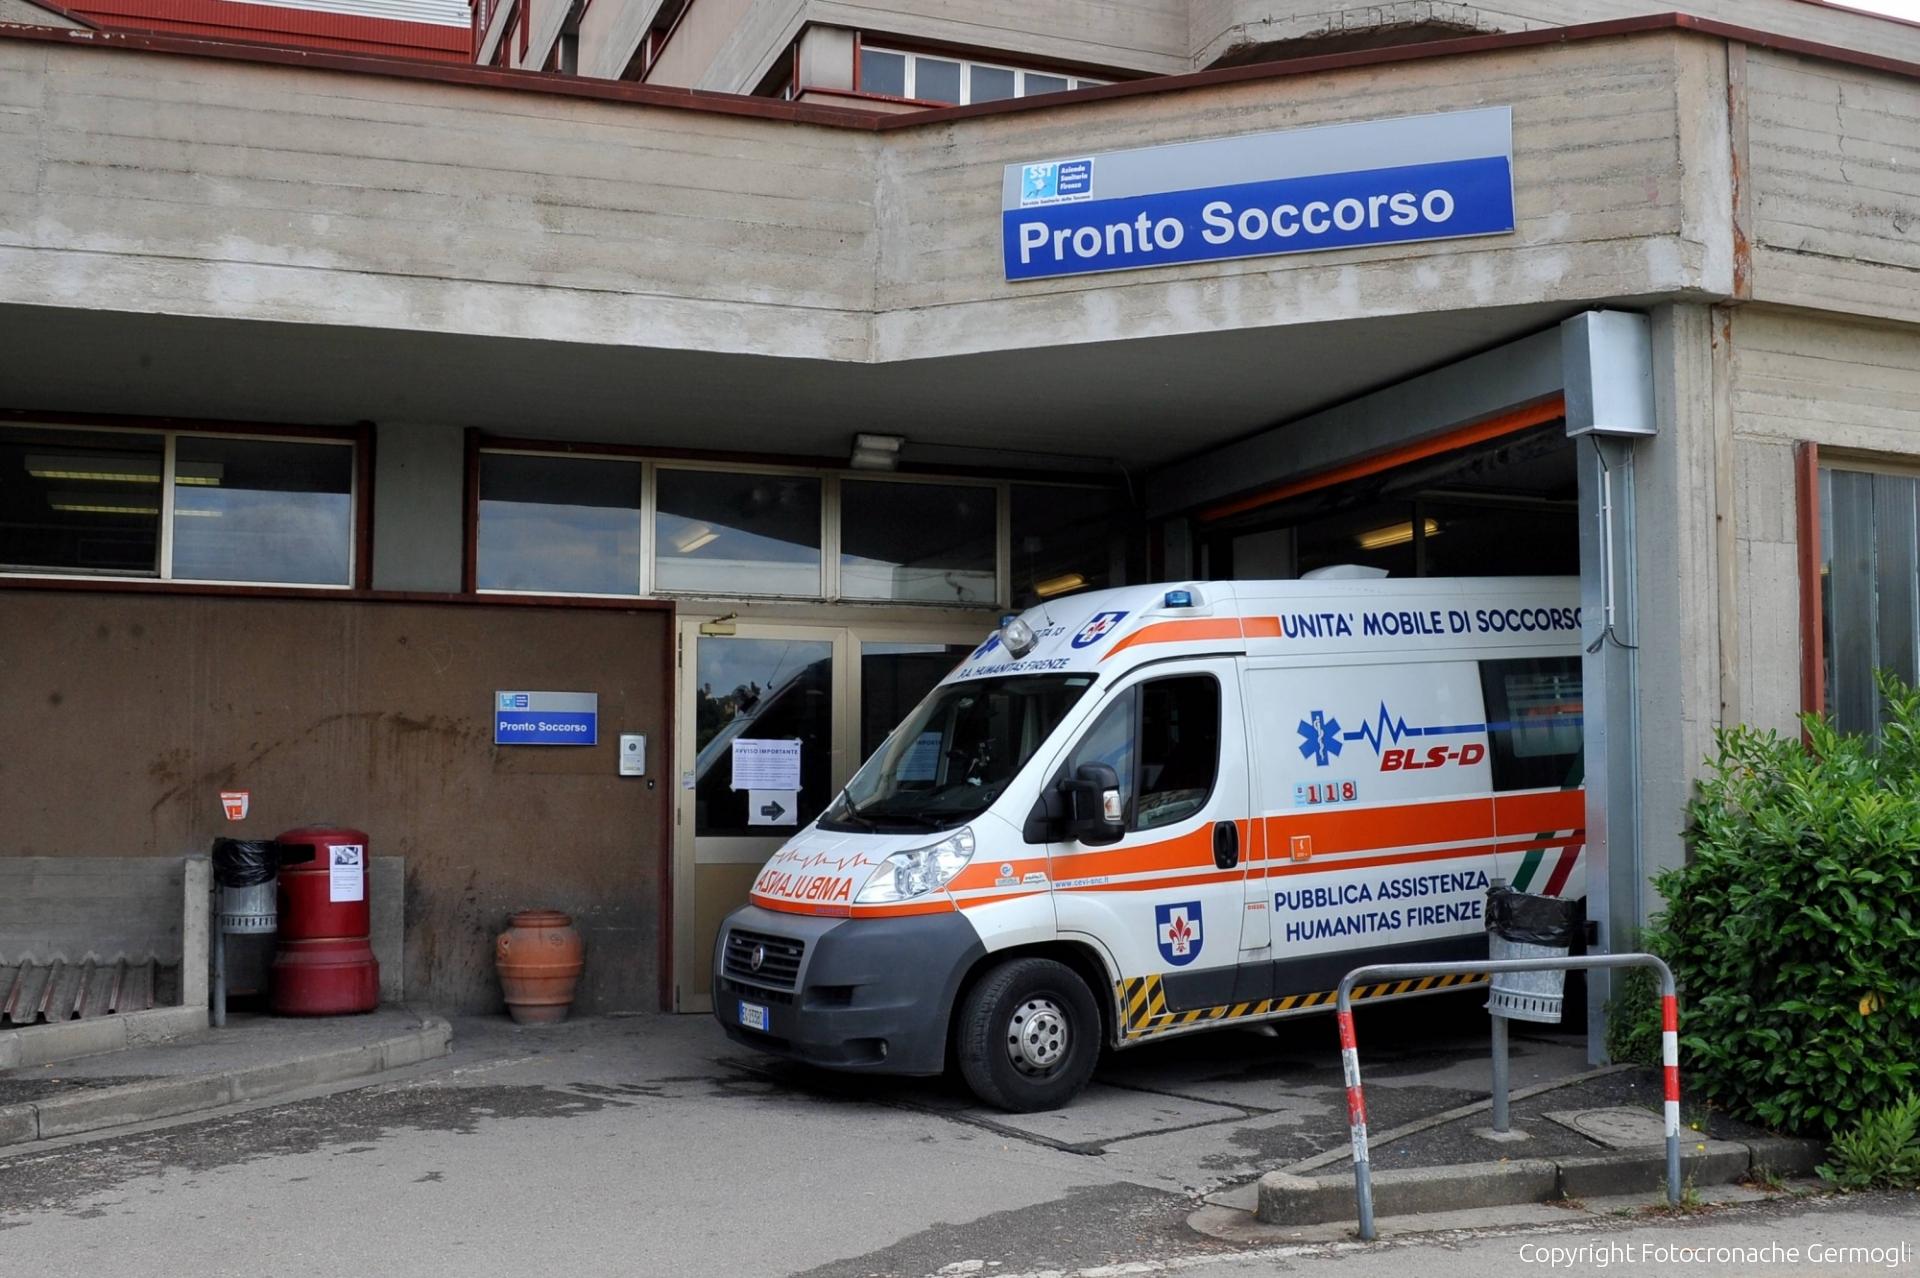 Meningite in Toscana: diagnosi di Meningococco C in un 43enne